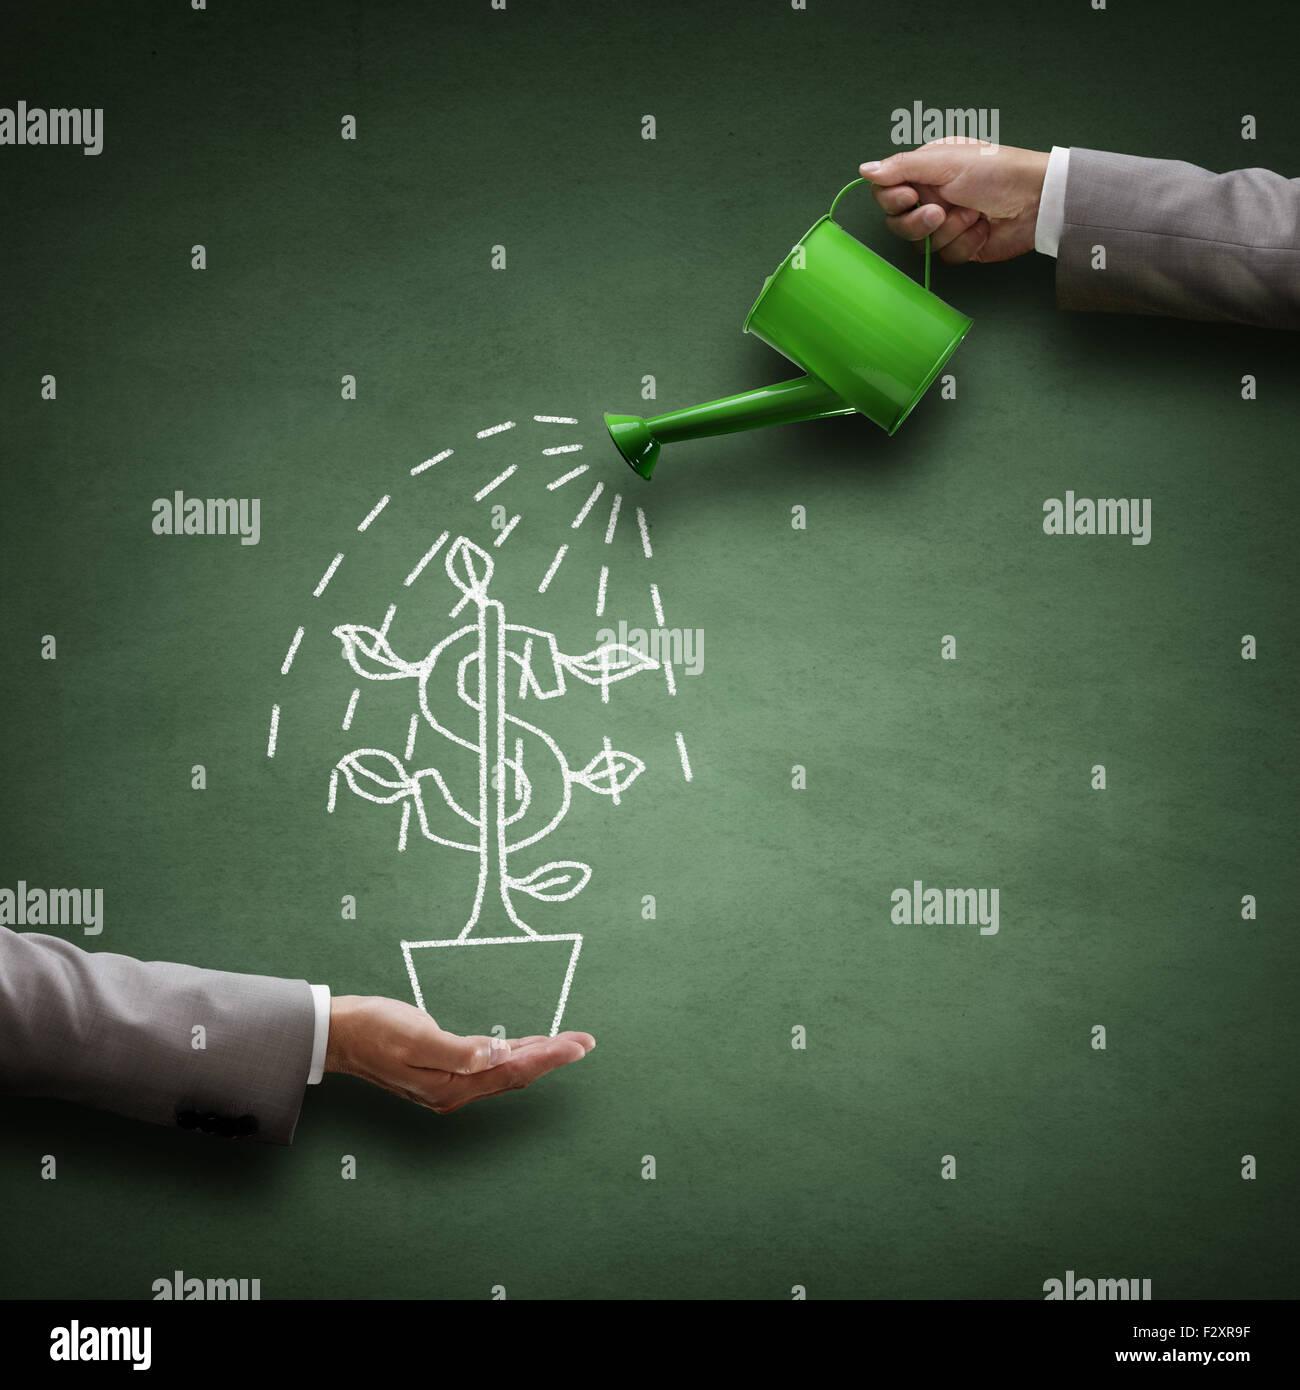 Finanzielles Wachstum Stockbild